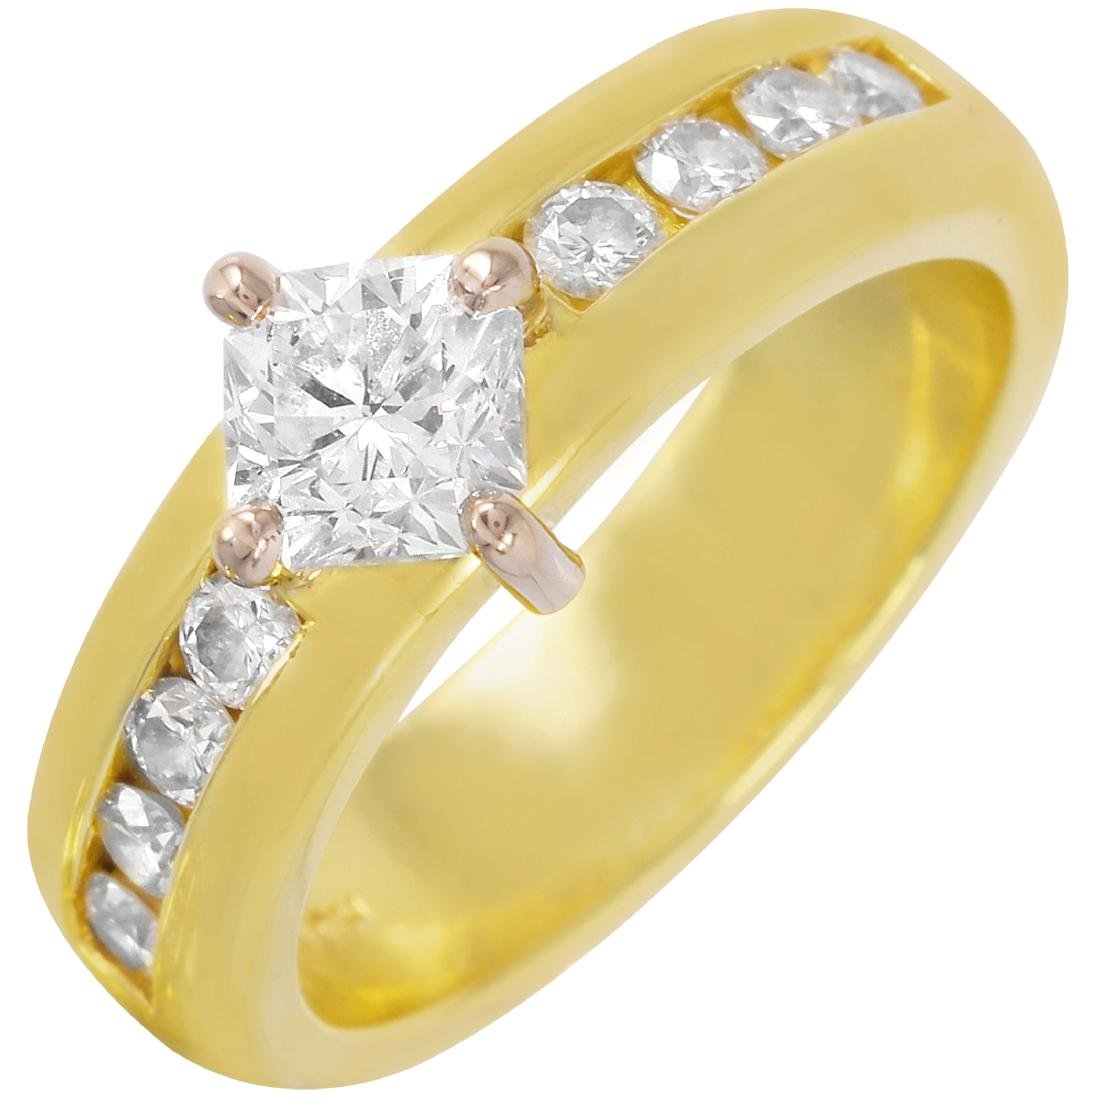 18KT Yellow Gold Diamond Engagement Ring